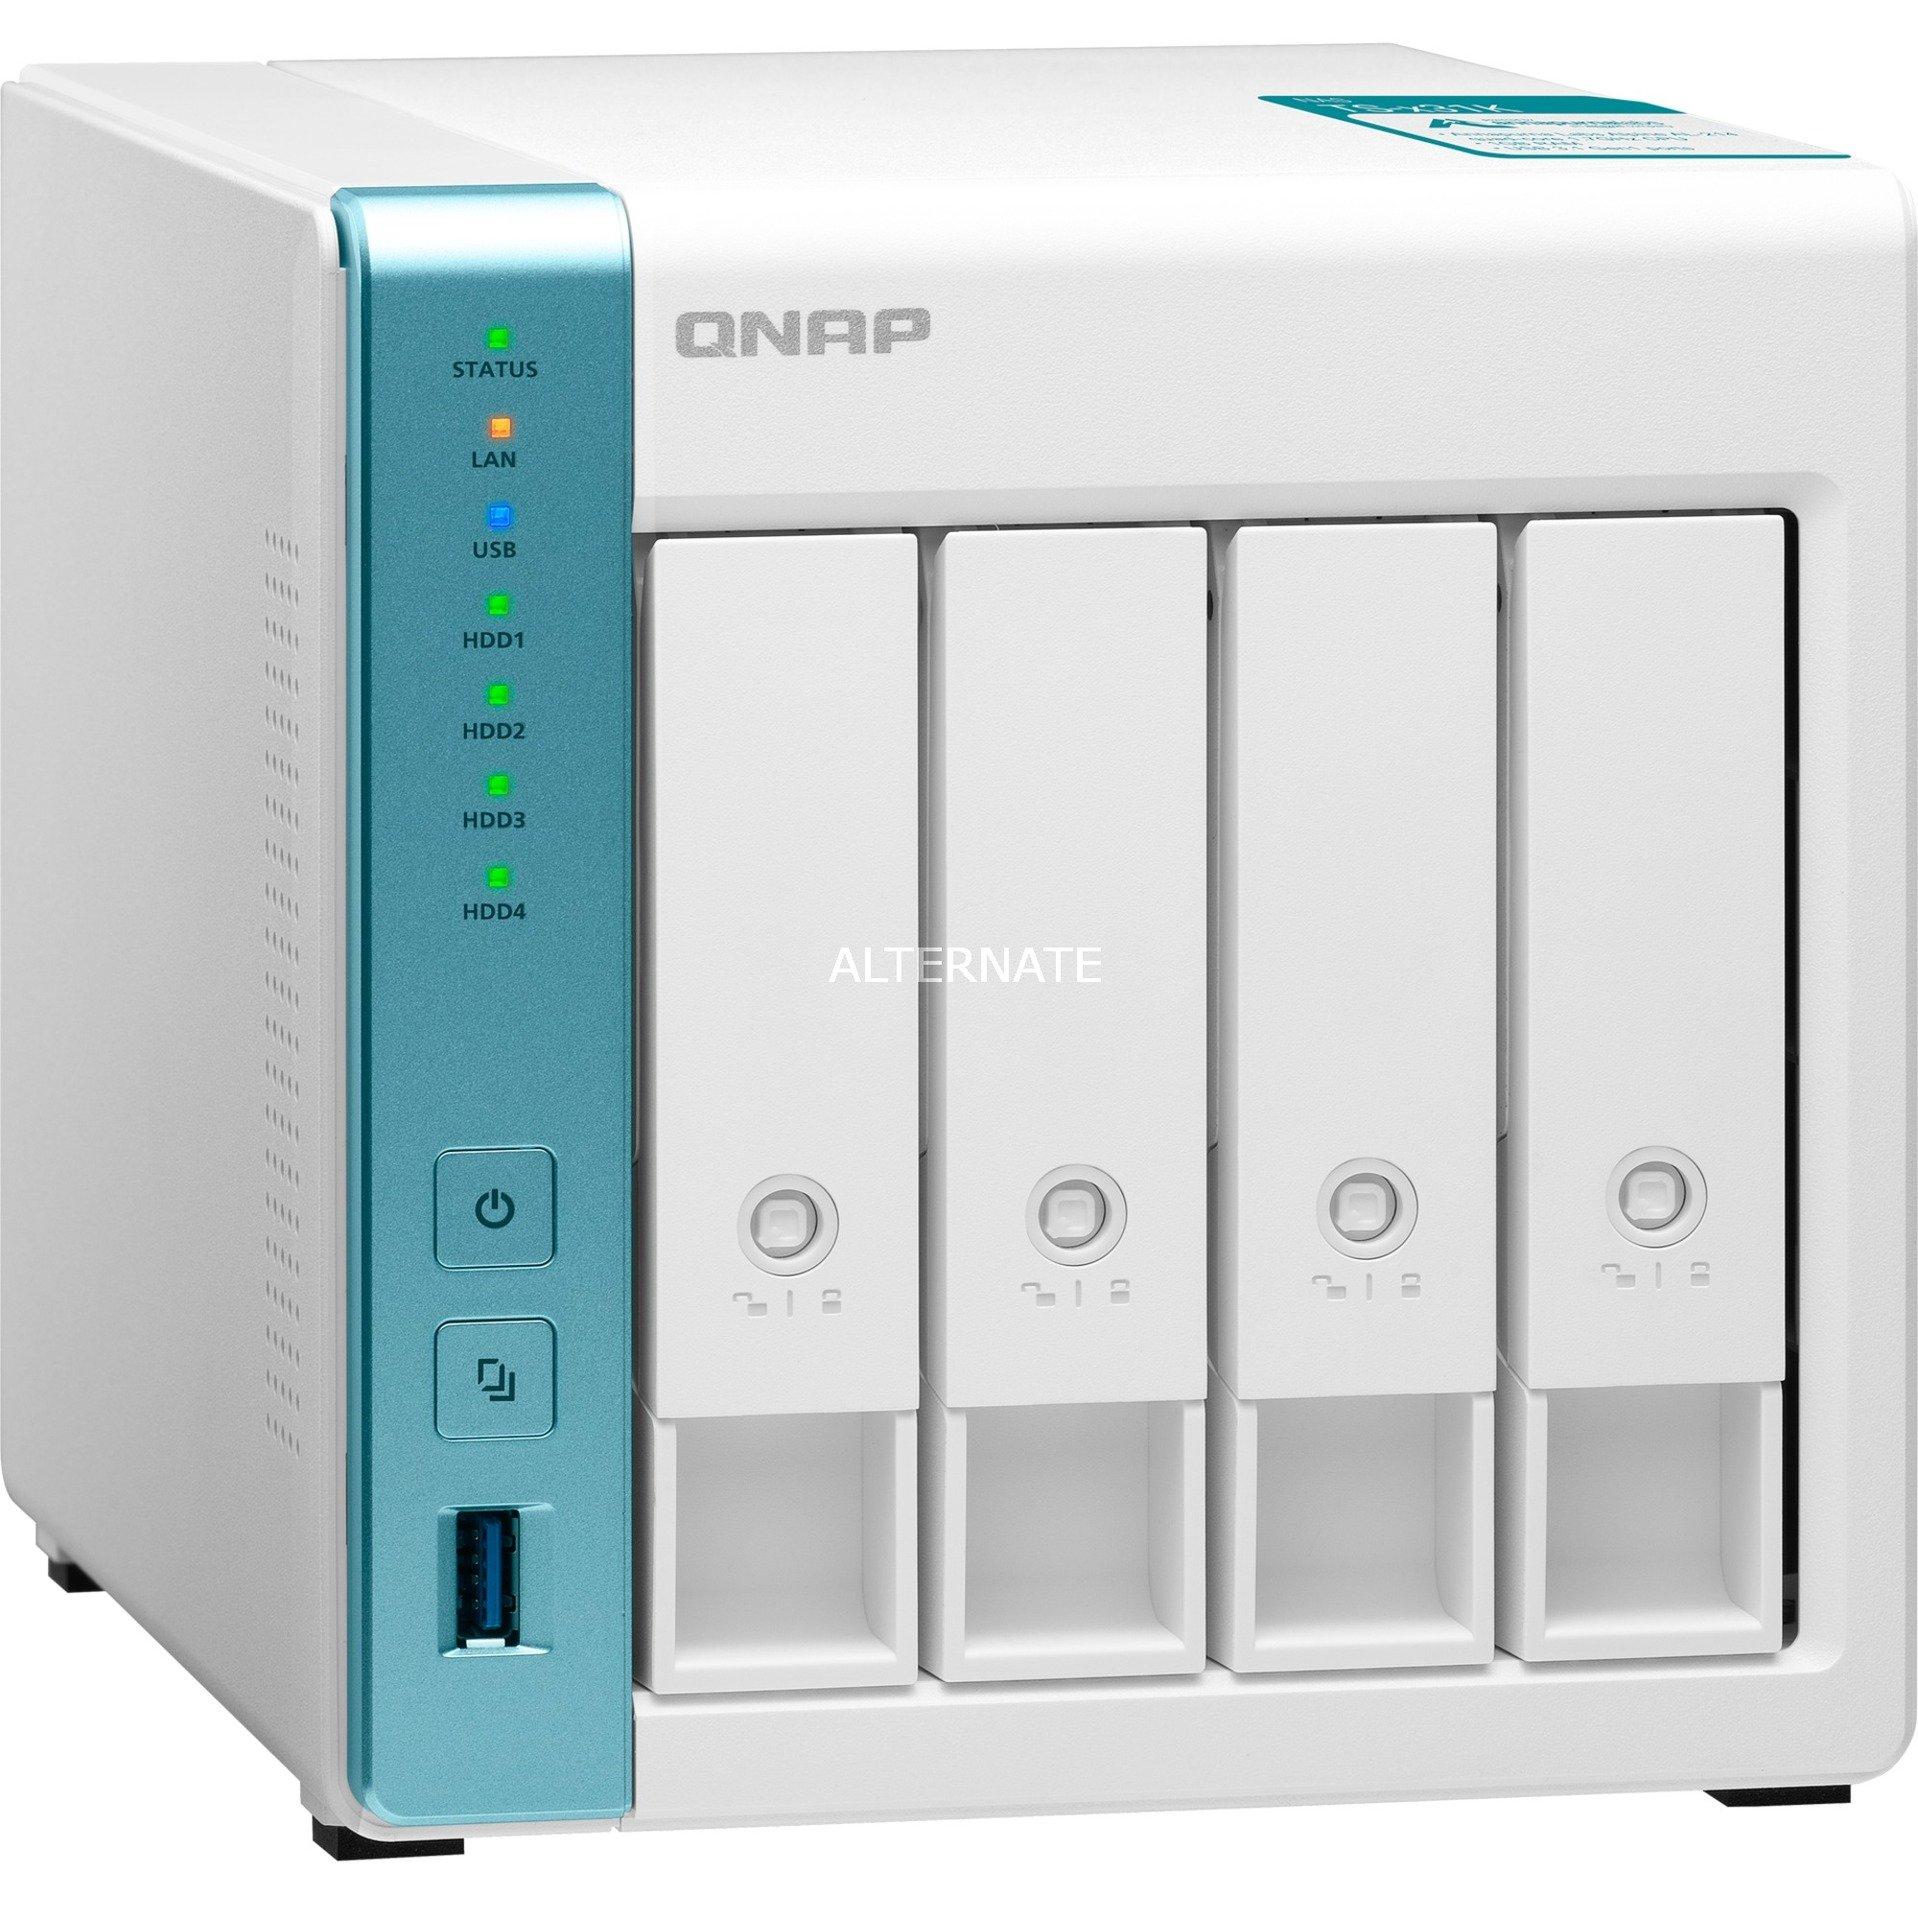 "QNAP 4-Bay NAS-Gehäuse TS-431K (4x 3.5""/2.5"", AL214, 1GB RAM, 2x Gigabit-LAN, 3x USB-A 3.0)"